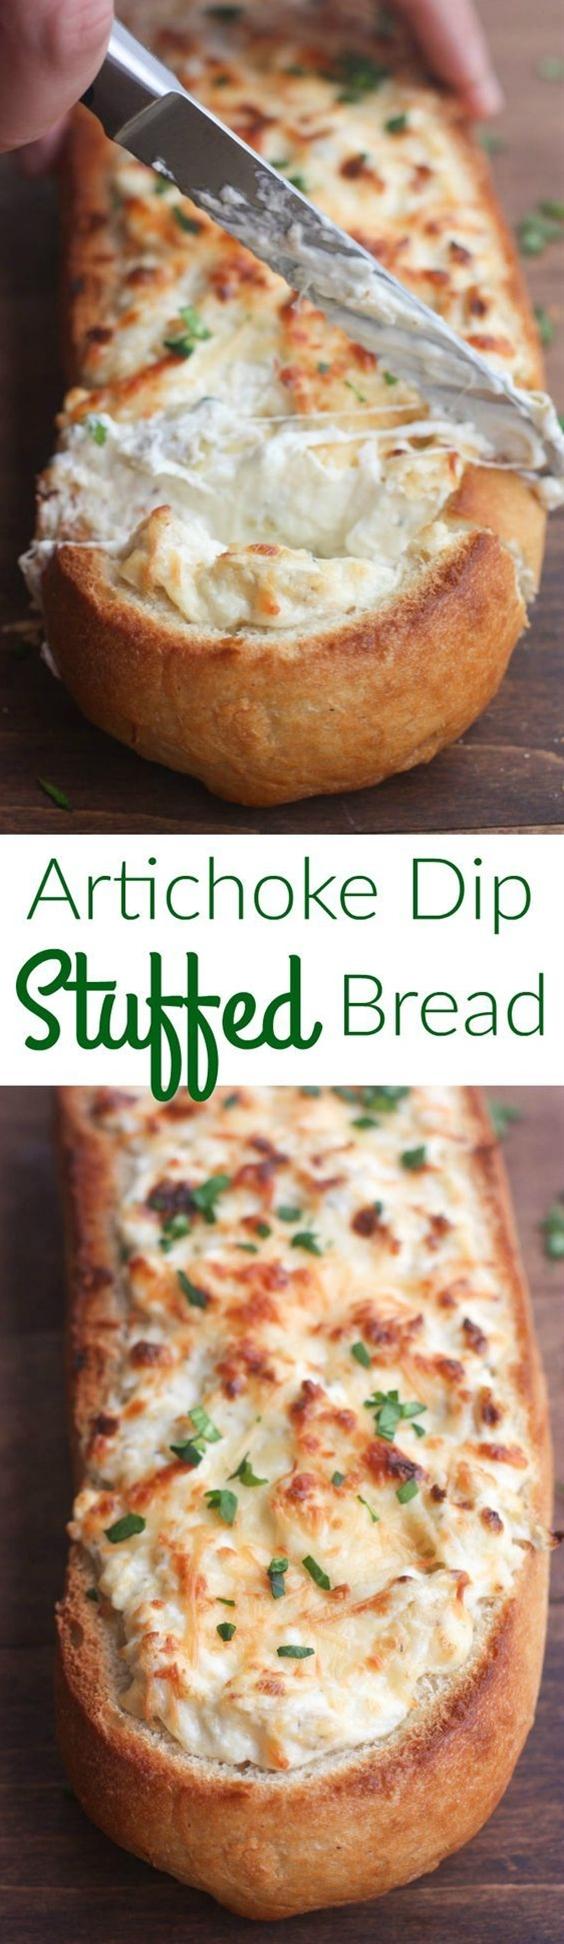 Artichoke Dip Stuffed Bread - our favorite hot artichoke dip recipe stuffed into a delicious crusty baguette. Makes a great, easy party appetizer!| Tastes Better From Scratch